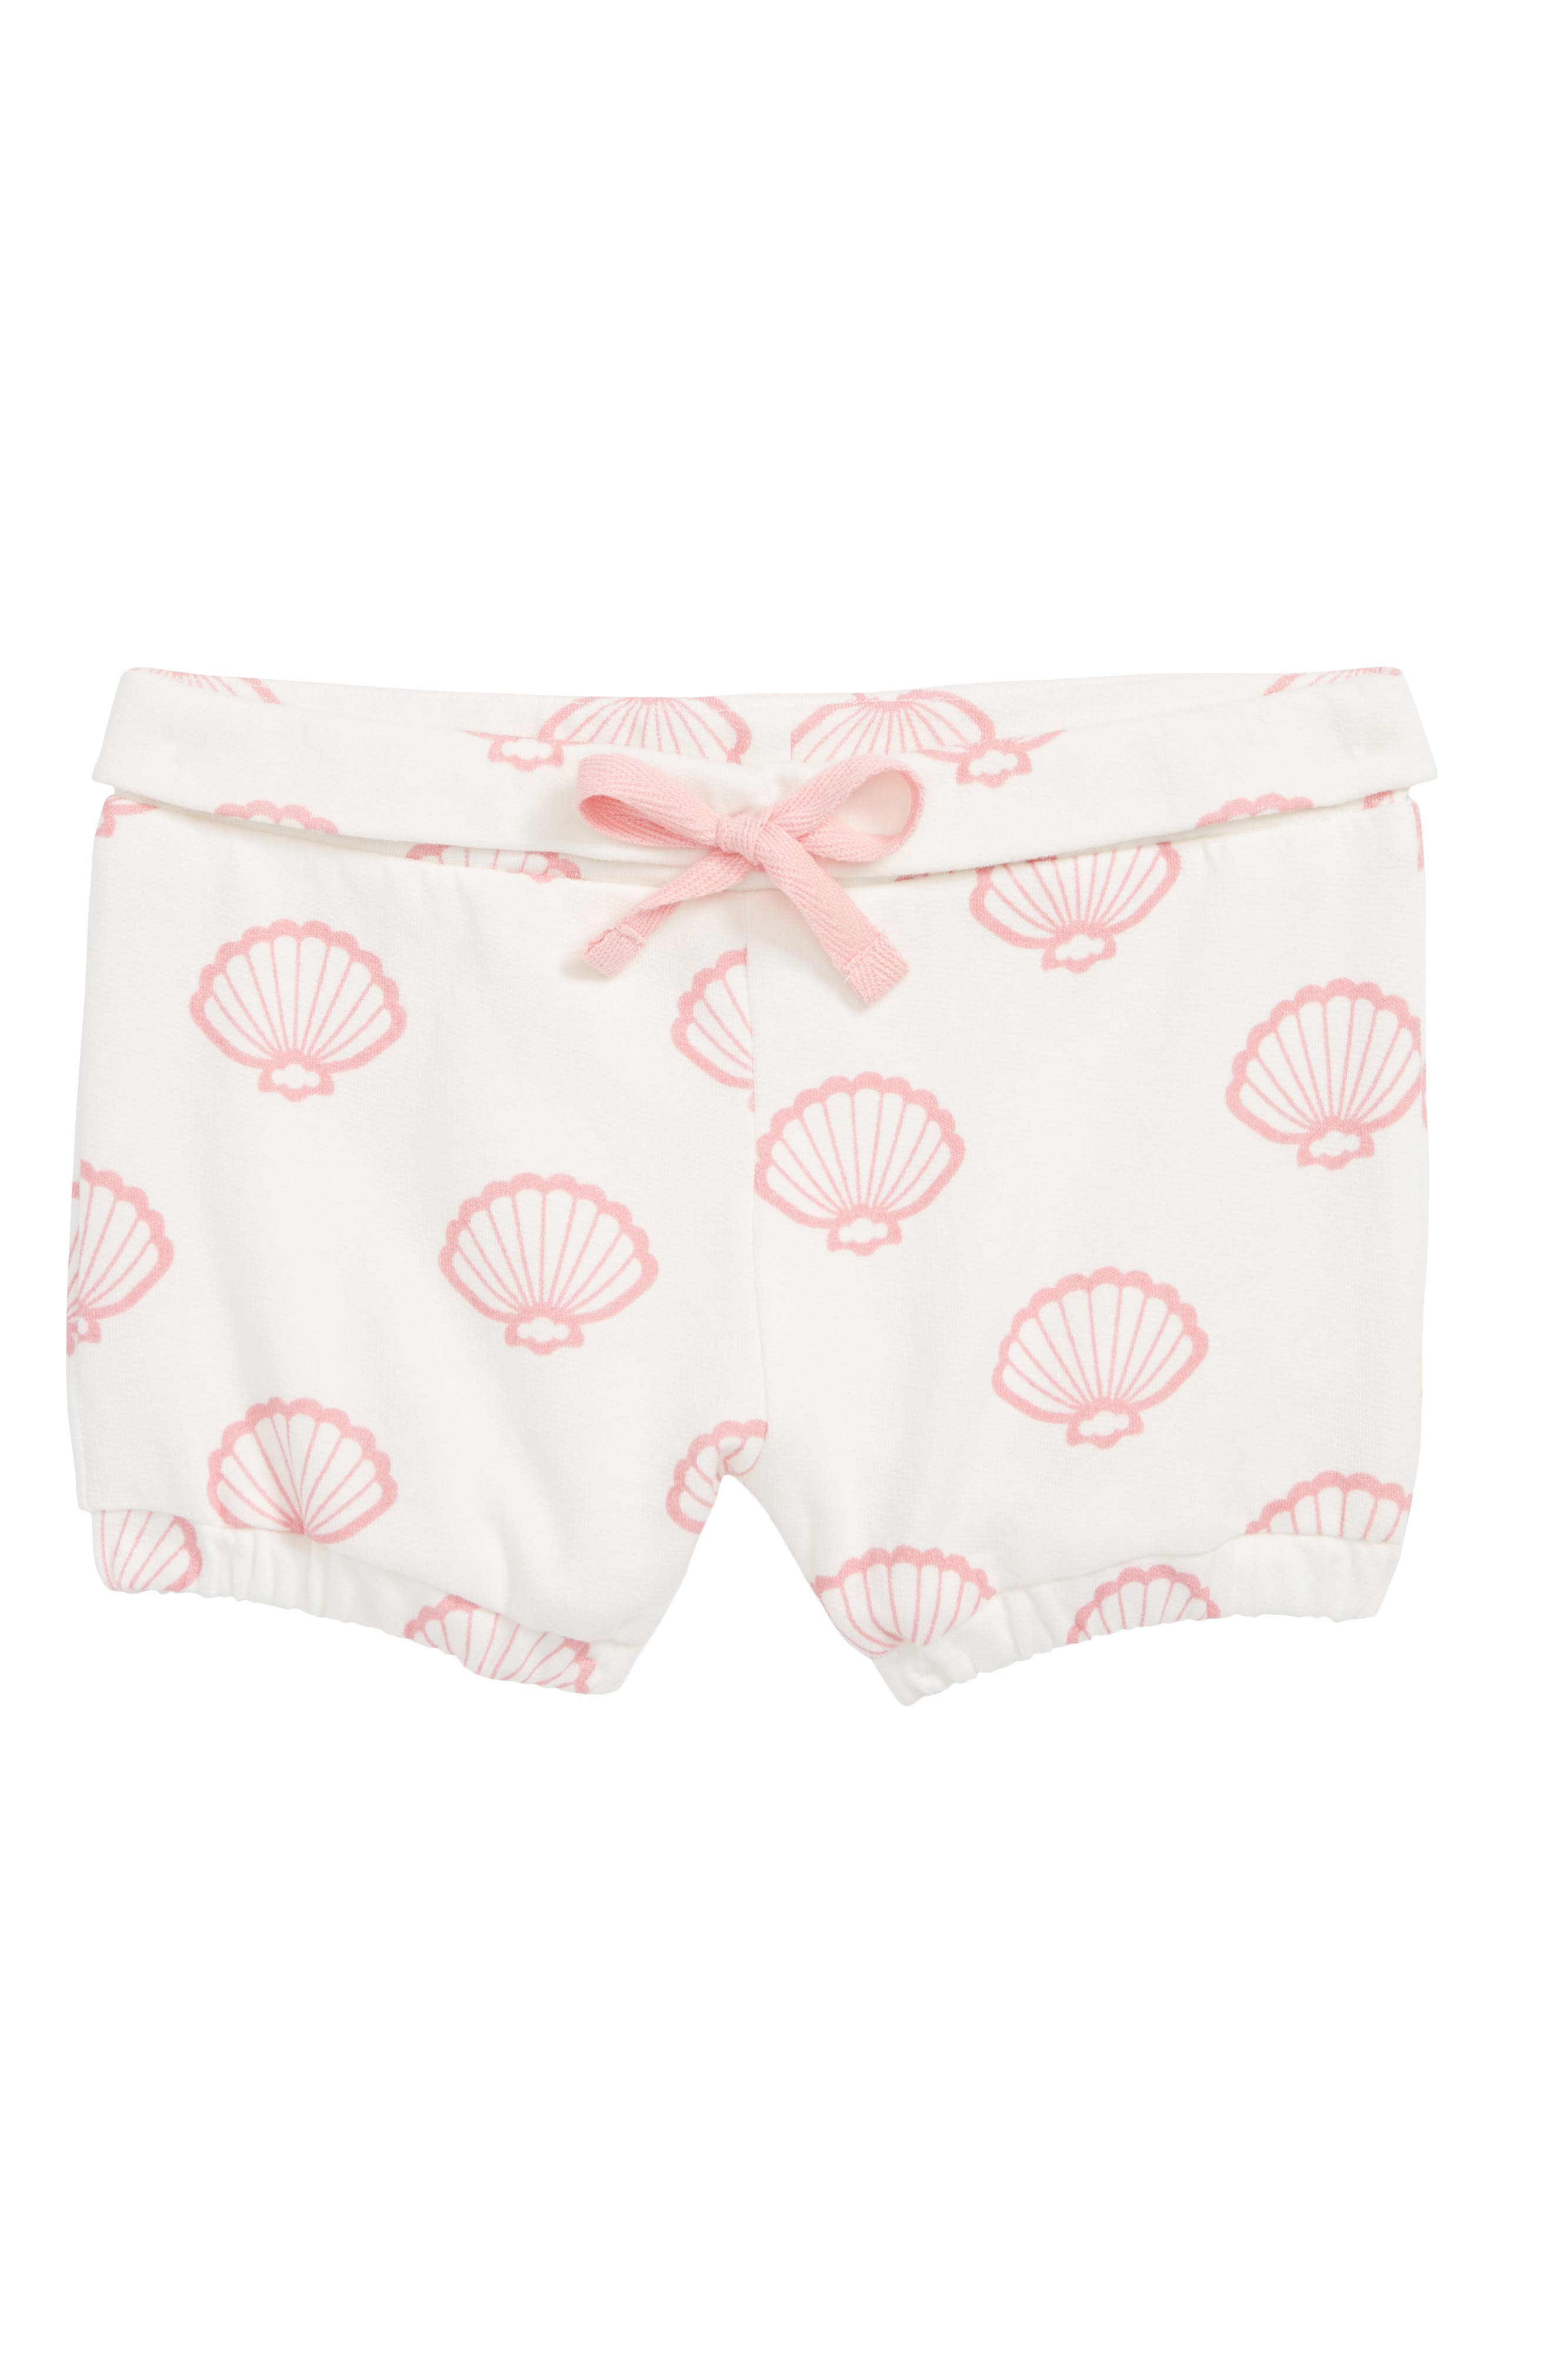 Organic Cotton Knit Shorts,                         Main,                         color, VITAMIN SEA